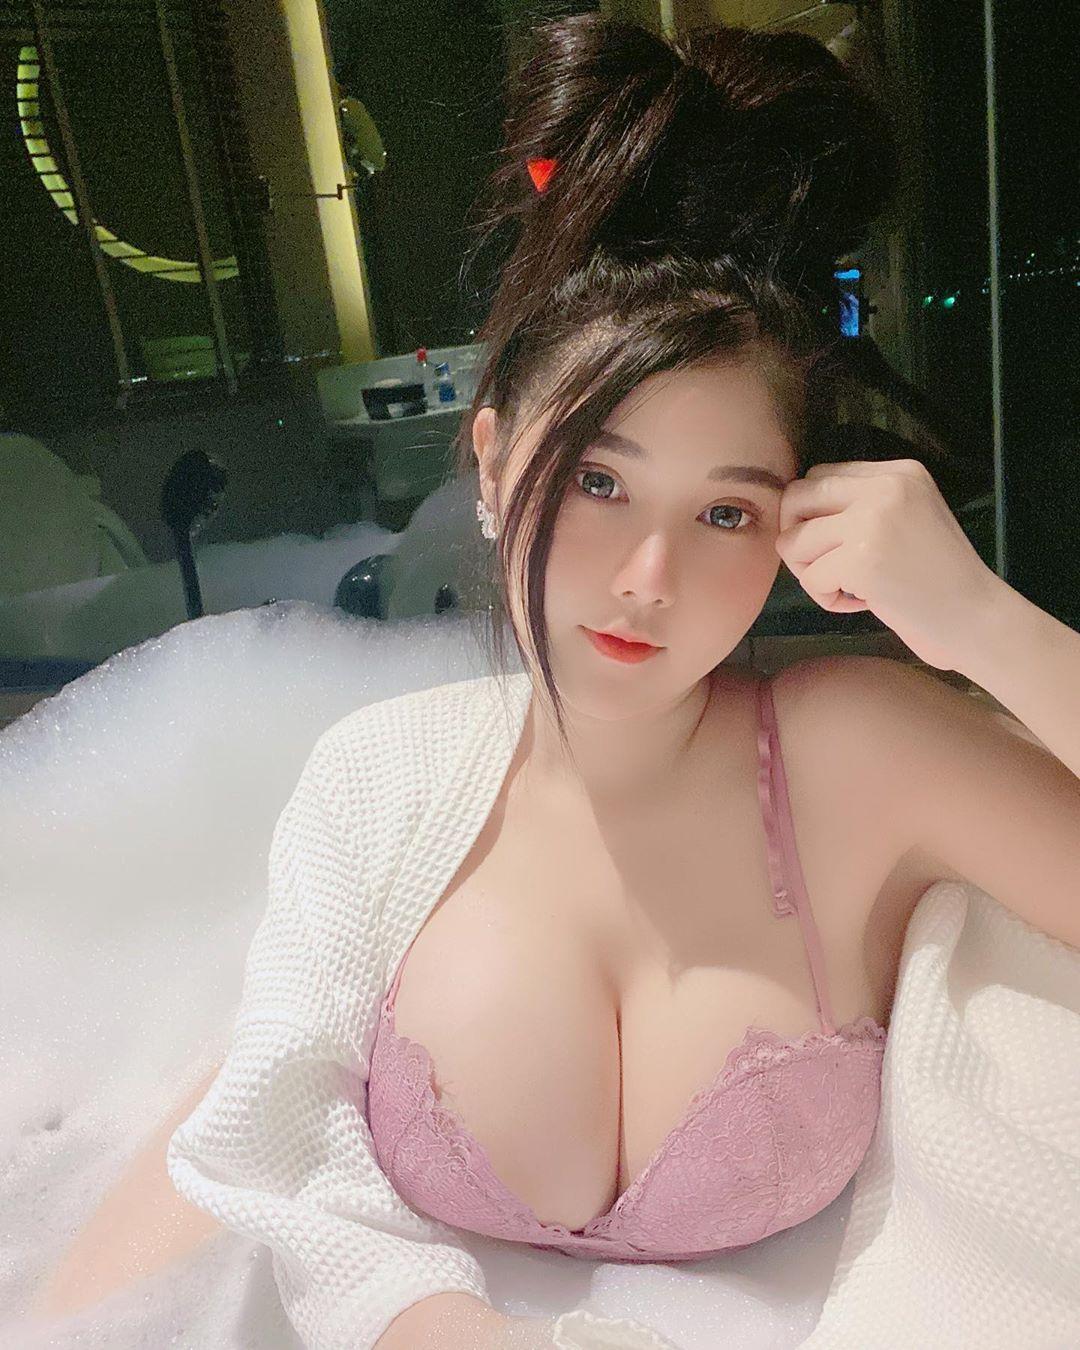 https://hongbiencang.com/images/news/2020/07/26/chf_1595745038.jpg